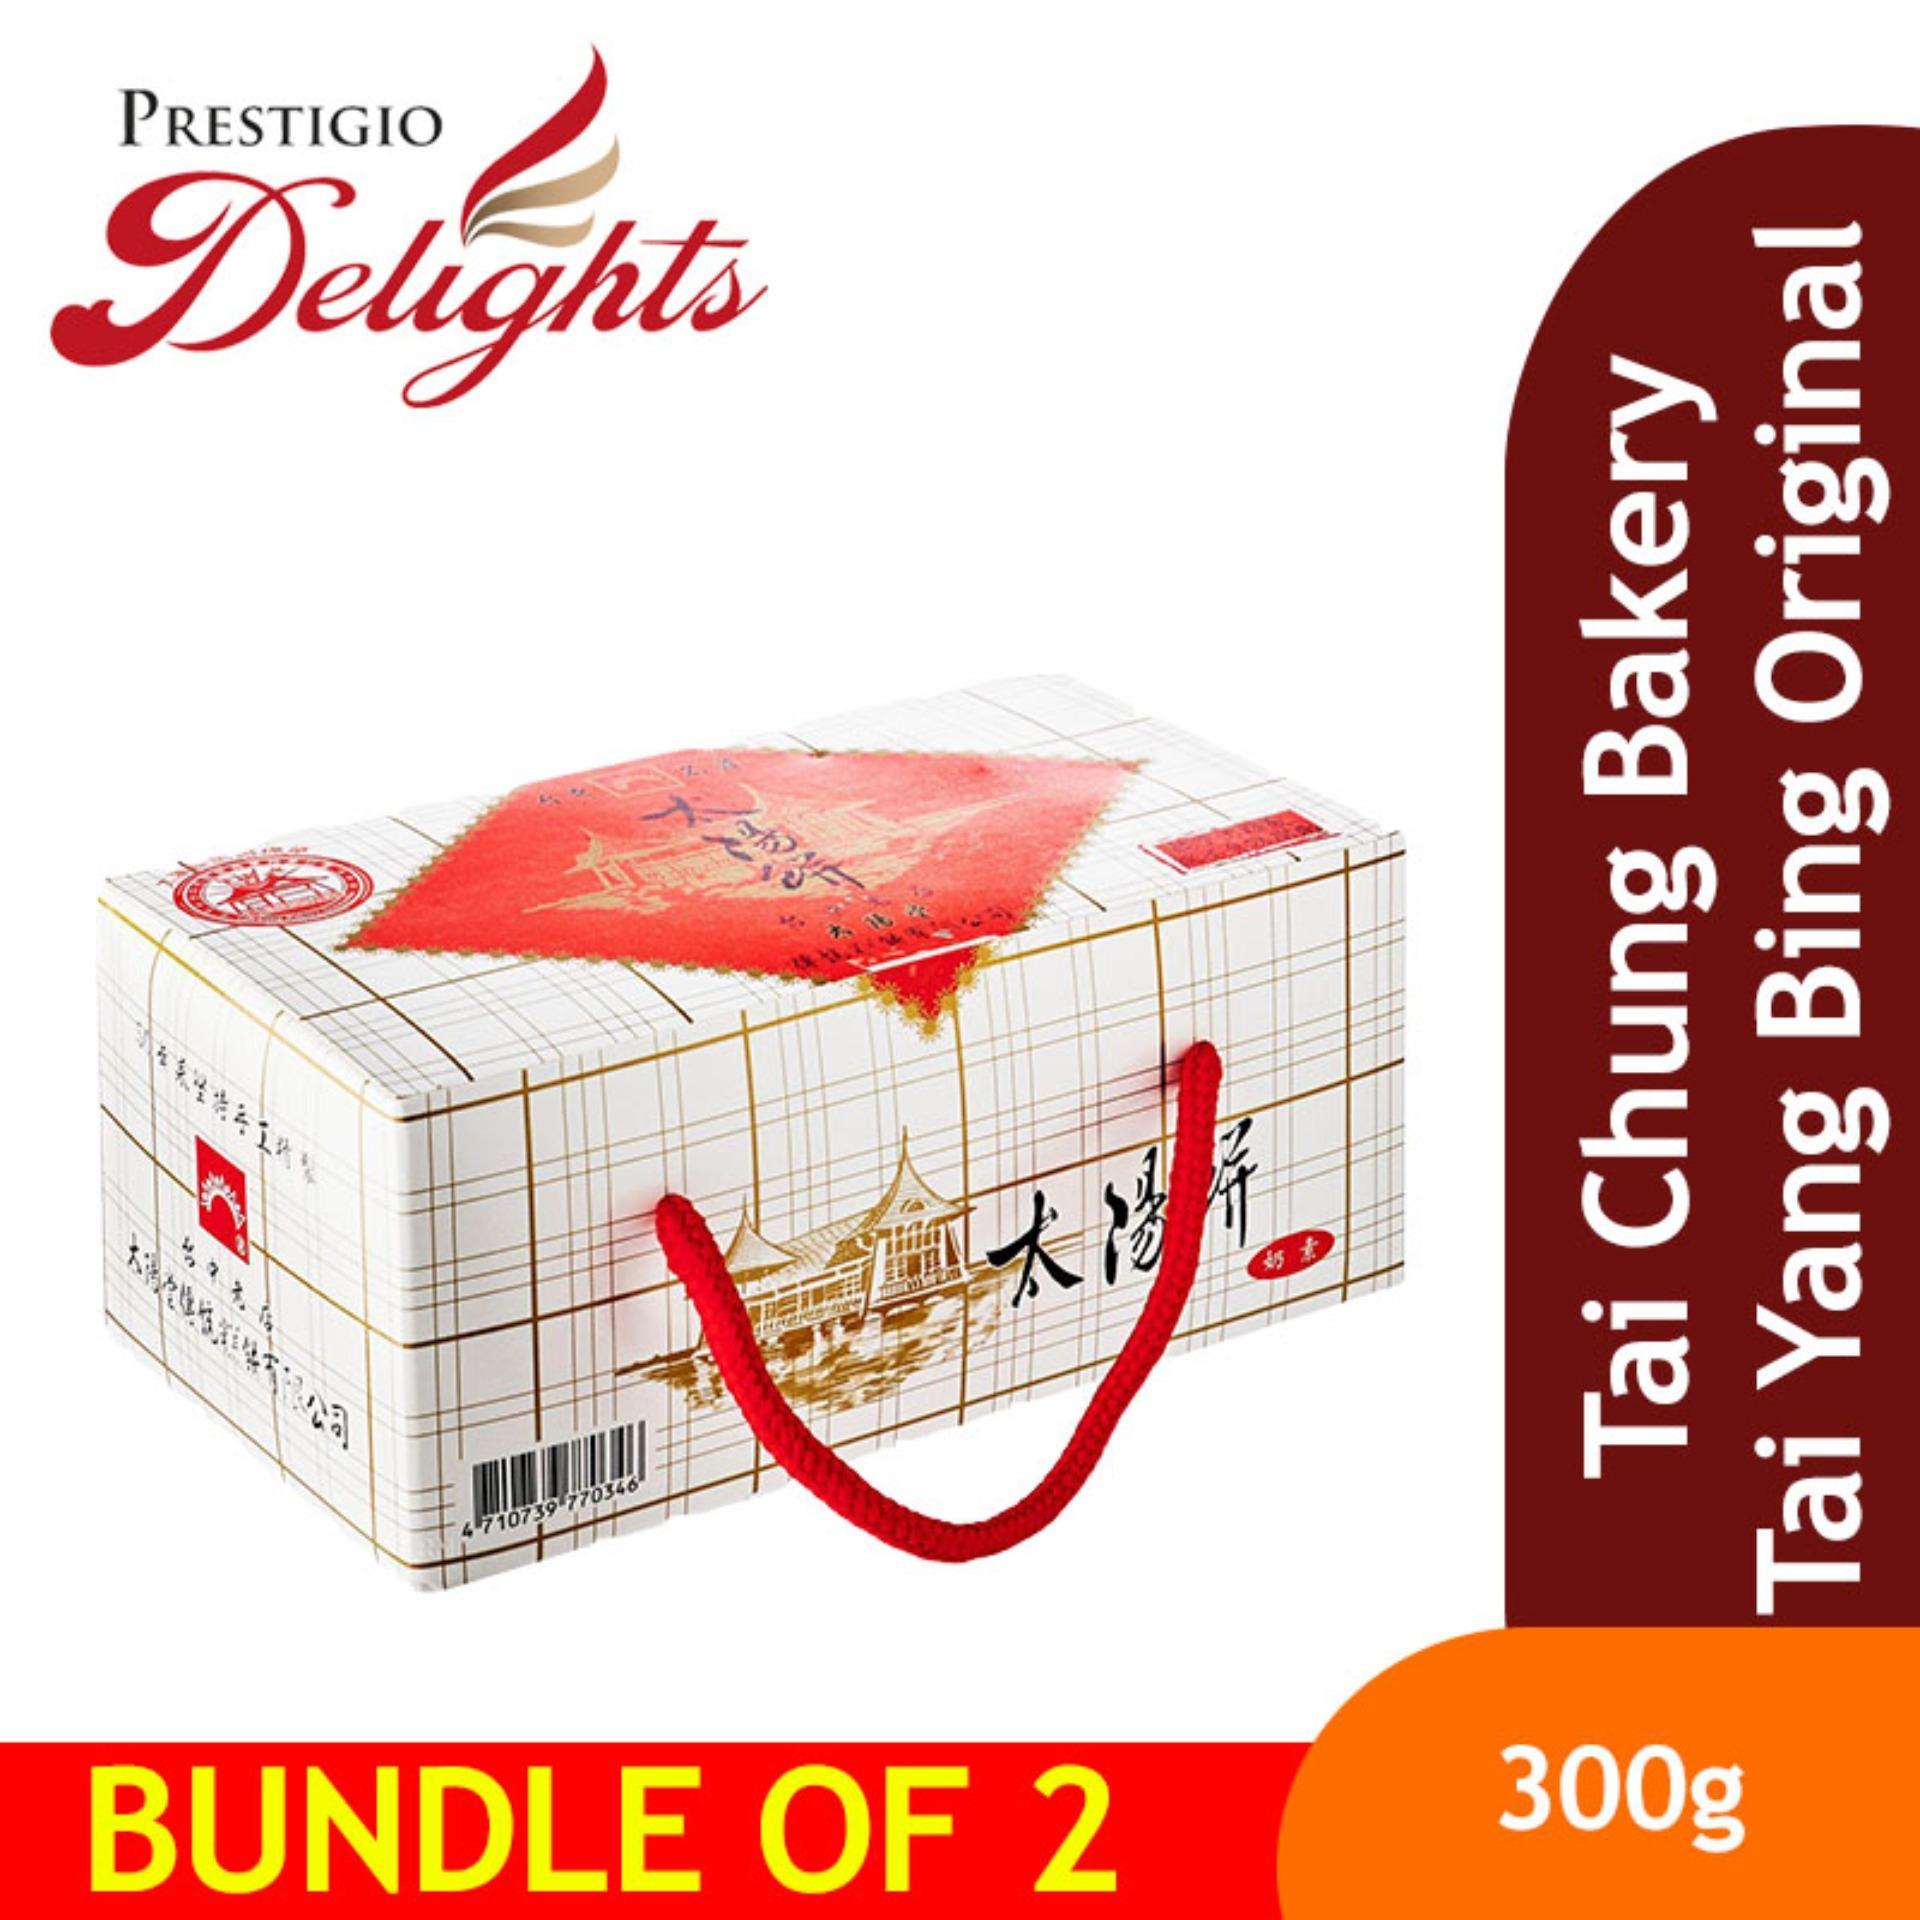 Tai Chung Bakery Tai Yang Bing Original Bundle Of 2 By Prestigio Delights.